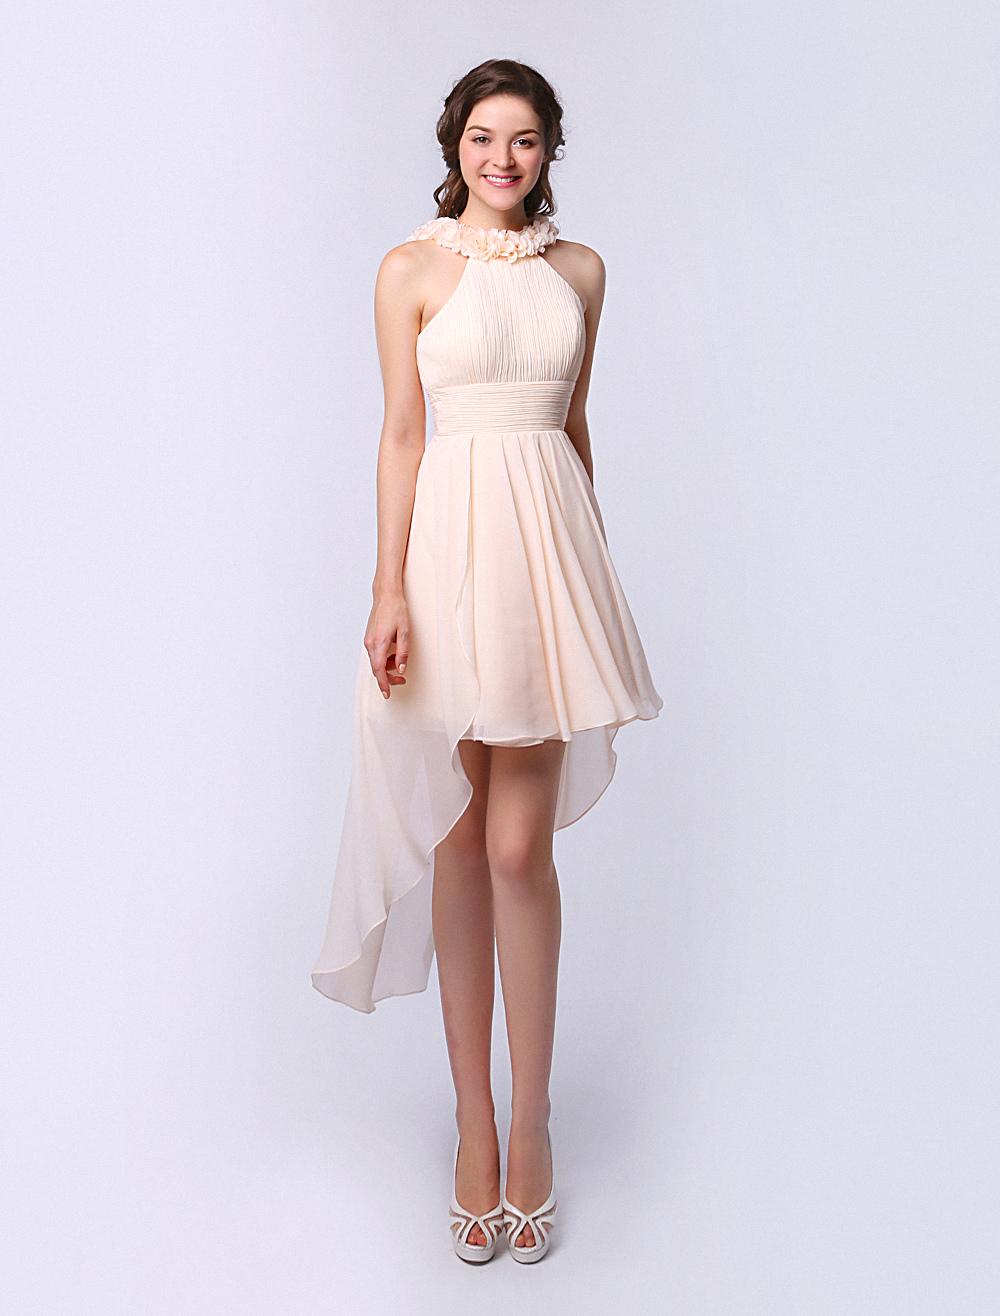 Halter Bridesmaid Dress With Chiffon